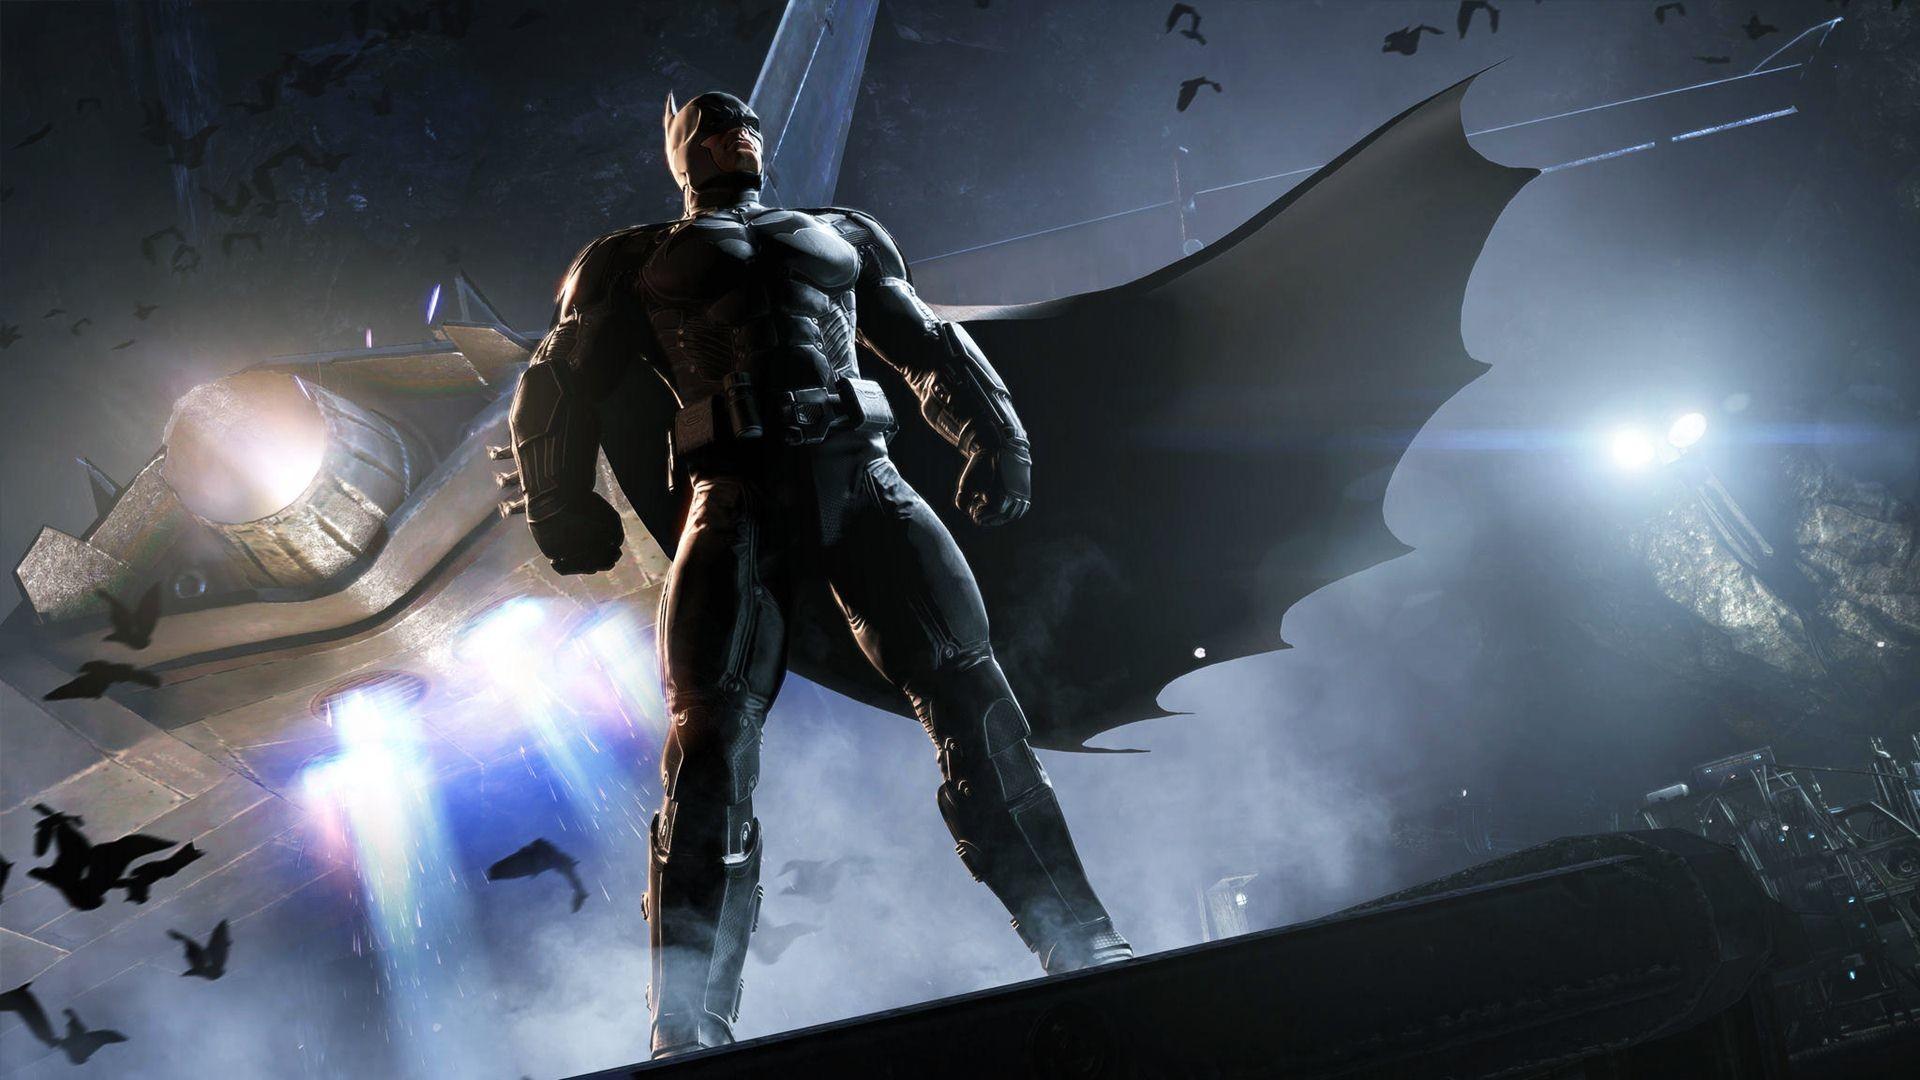 Batman Arkham Knight 4k Wallpaper 67 Images